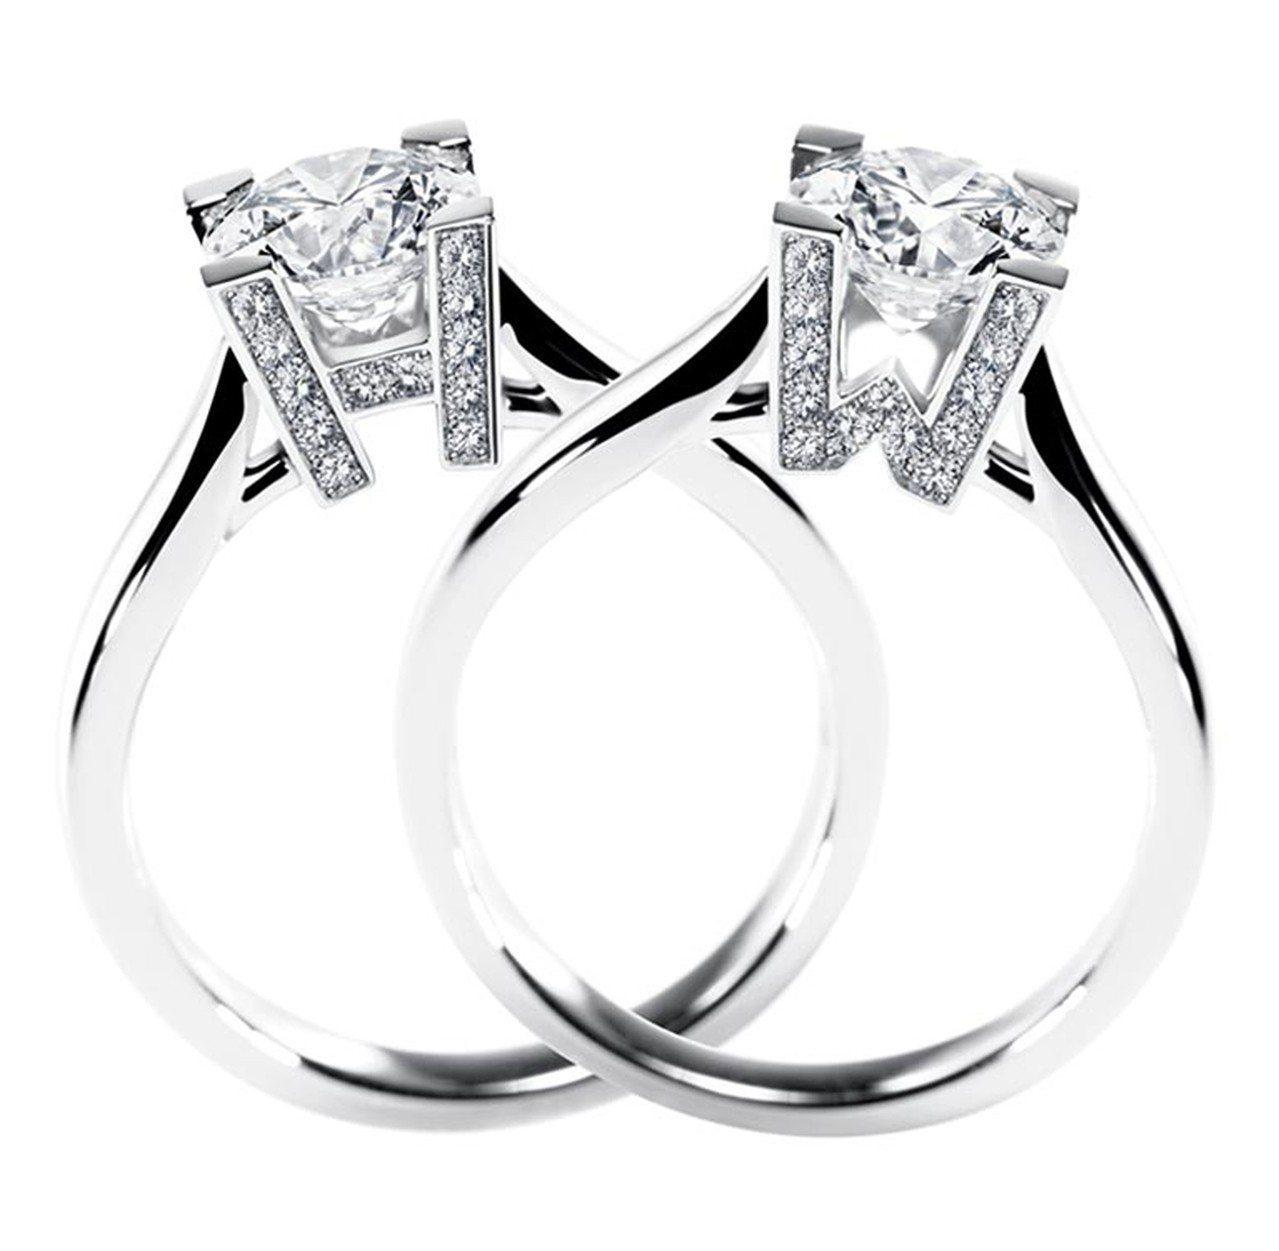 H.W. LOGO 系列鑽石婚戒,主石共有0.5、0.7與1.0克拉三種量可選,...